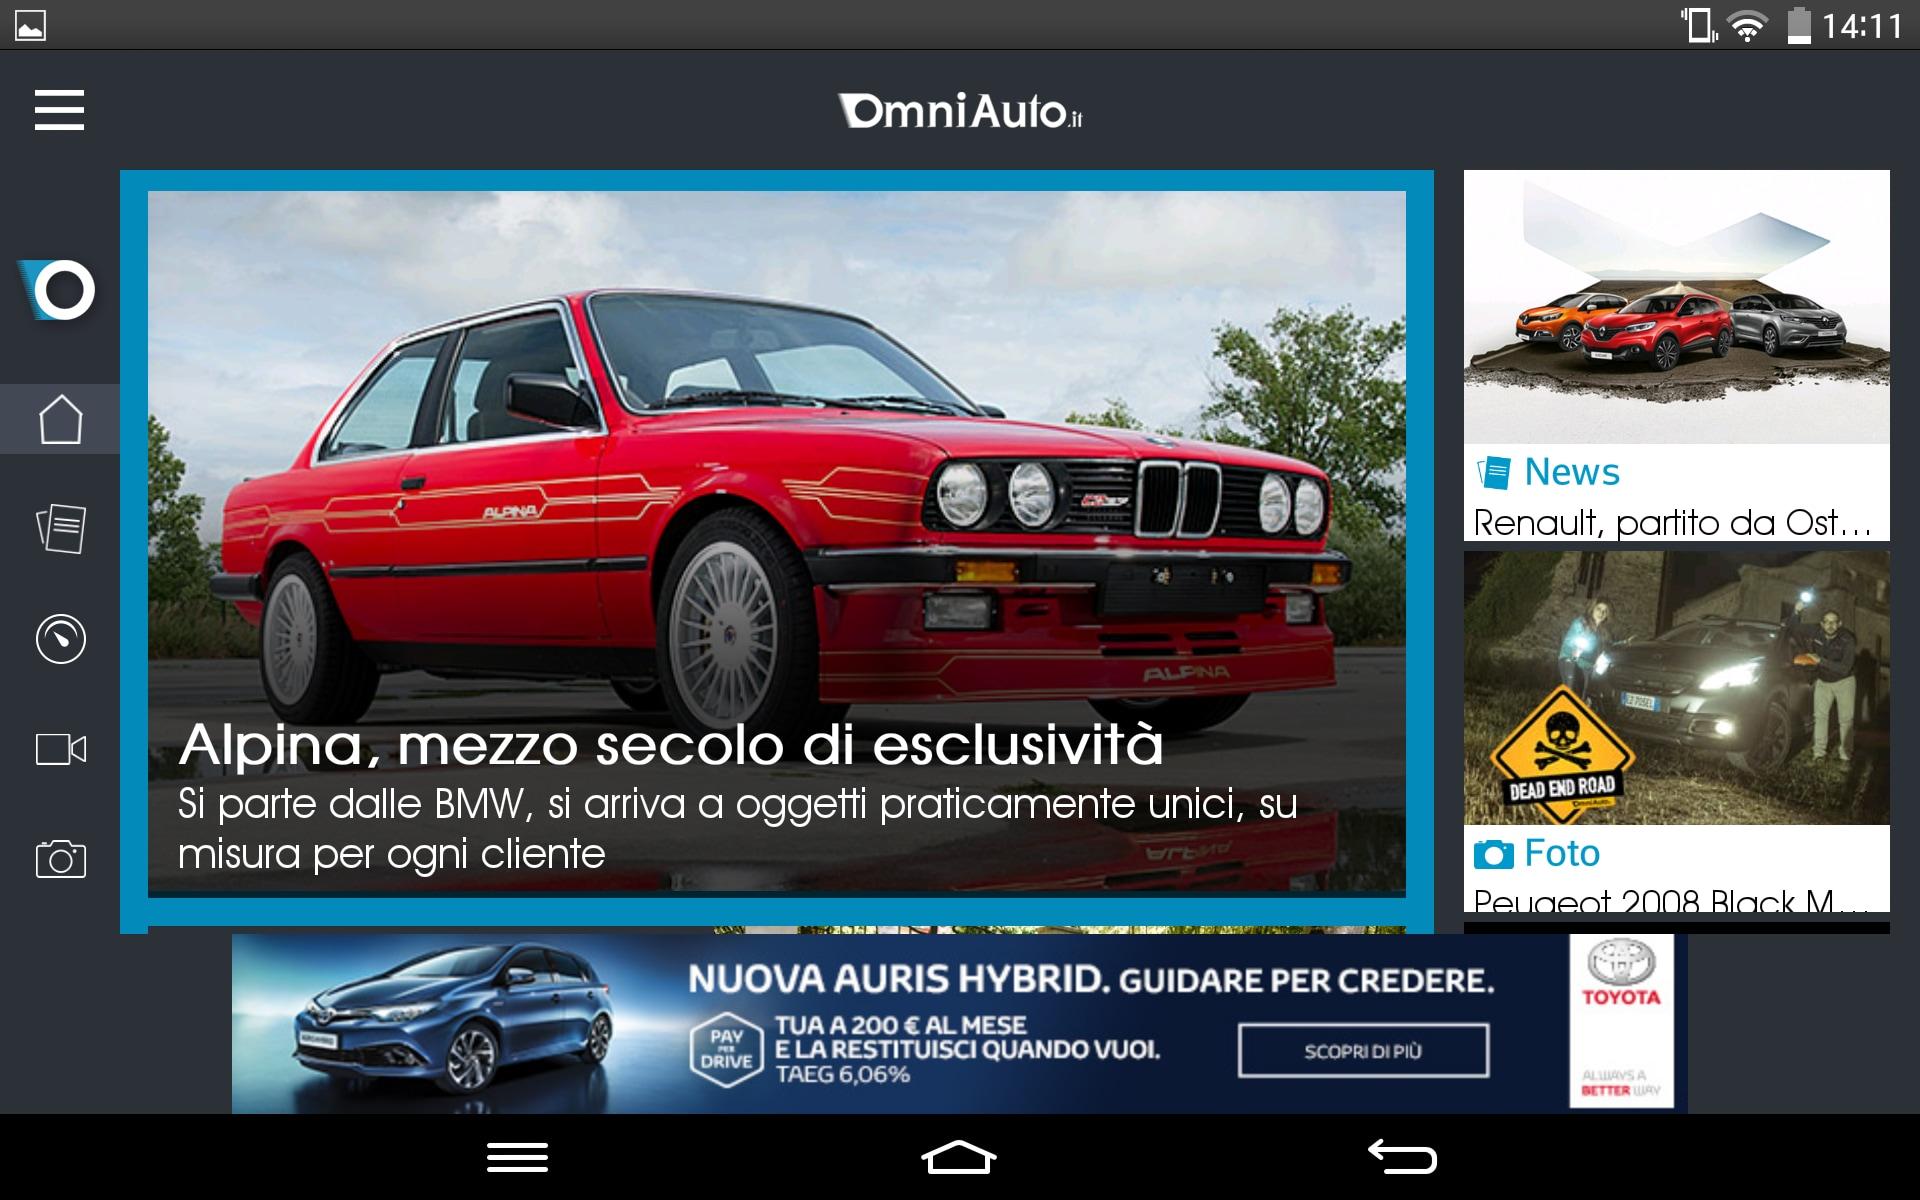 OmniAuto (2)